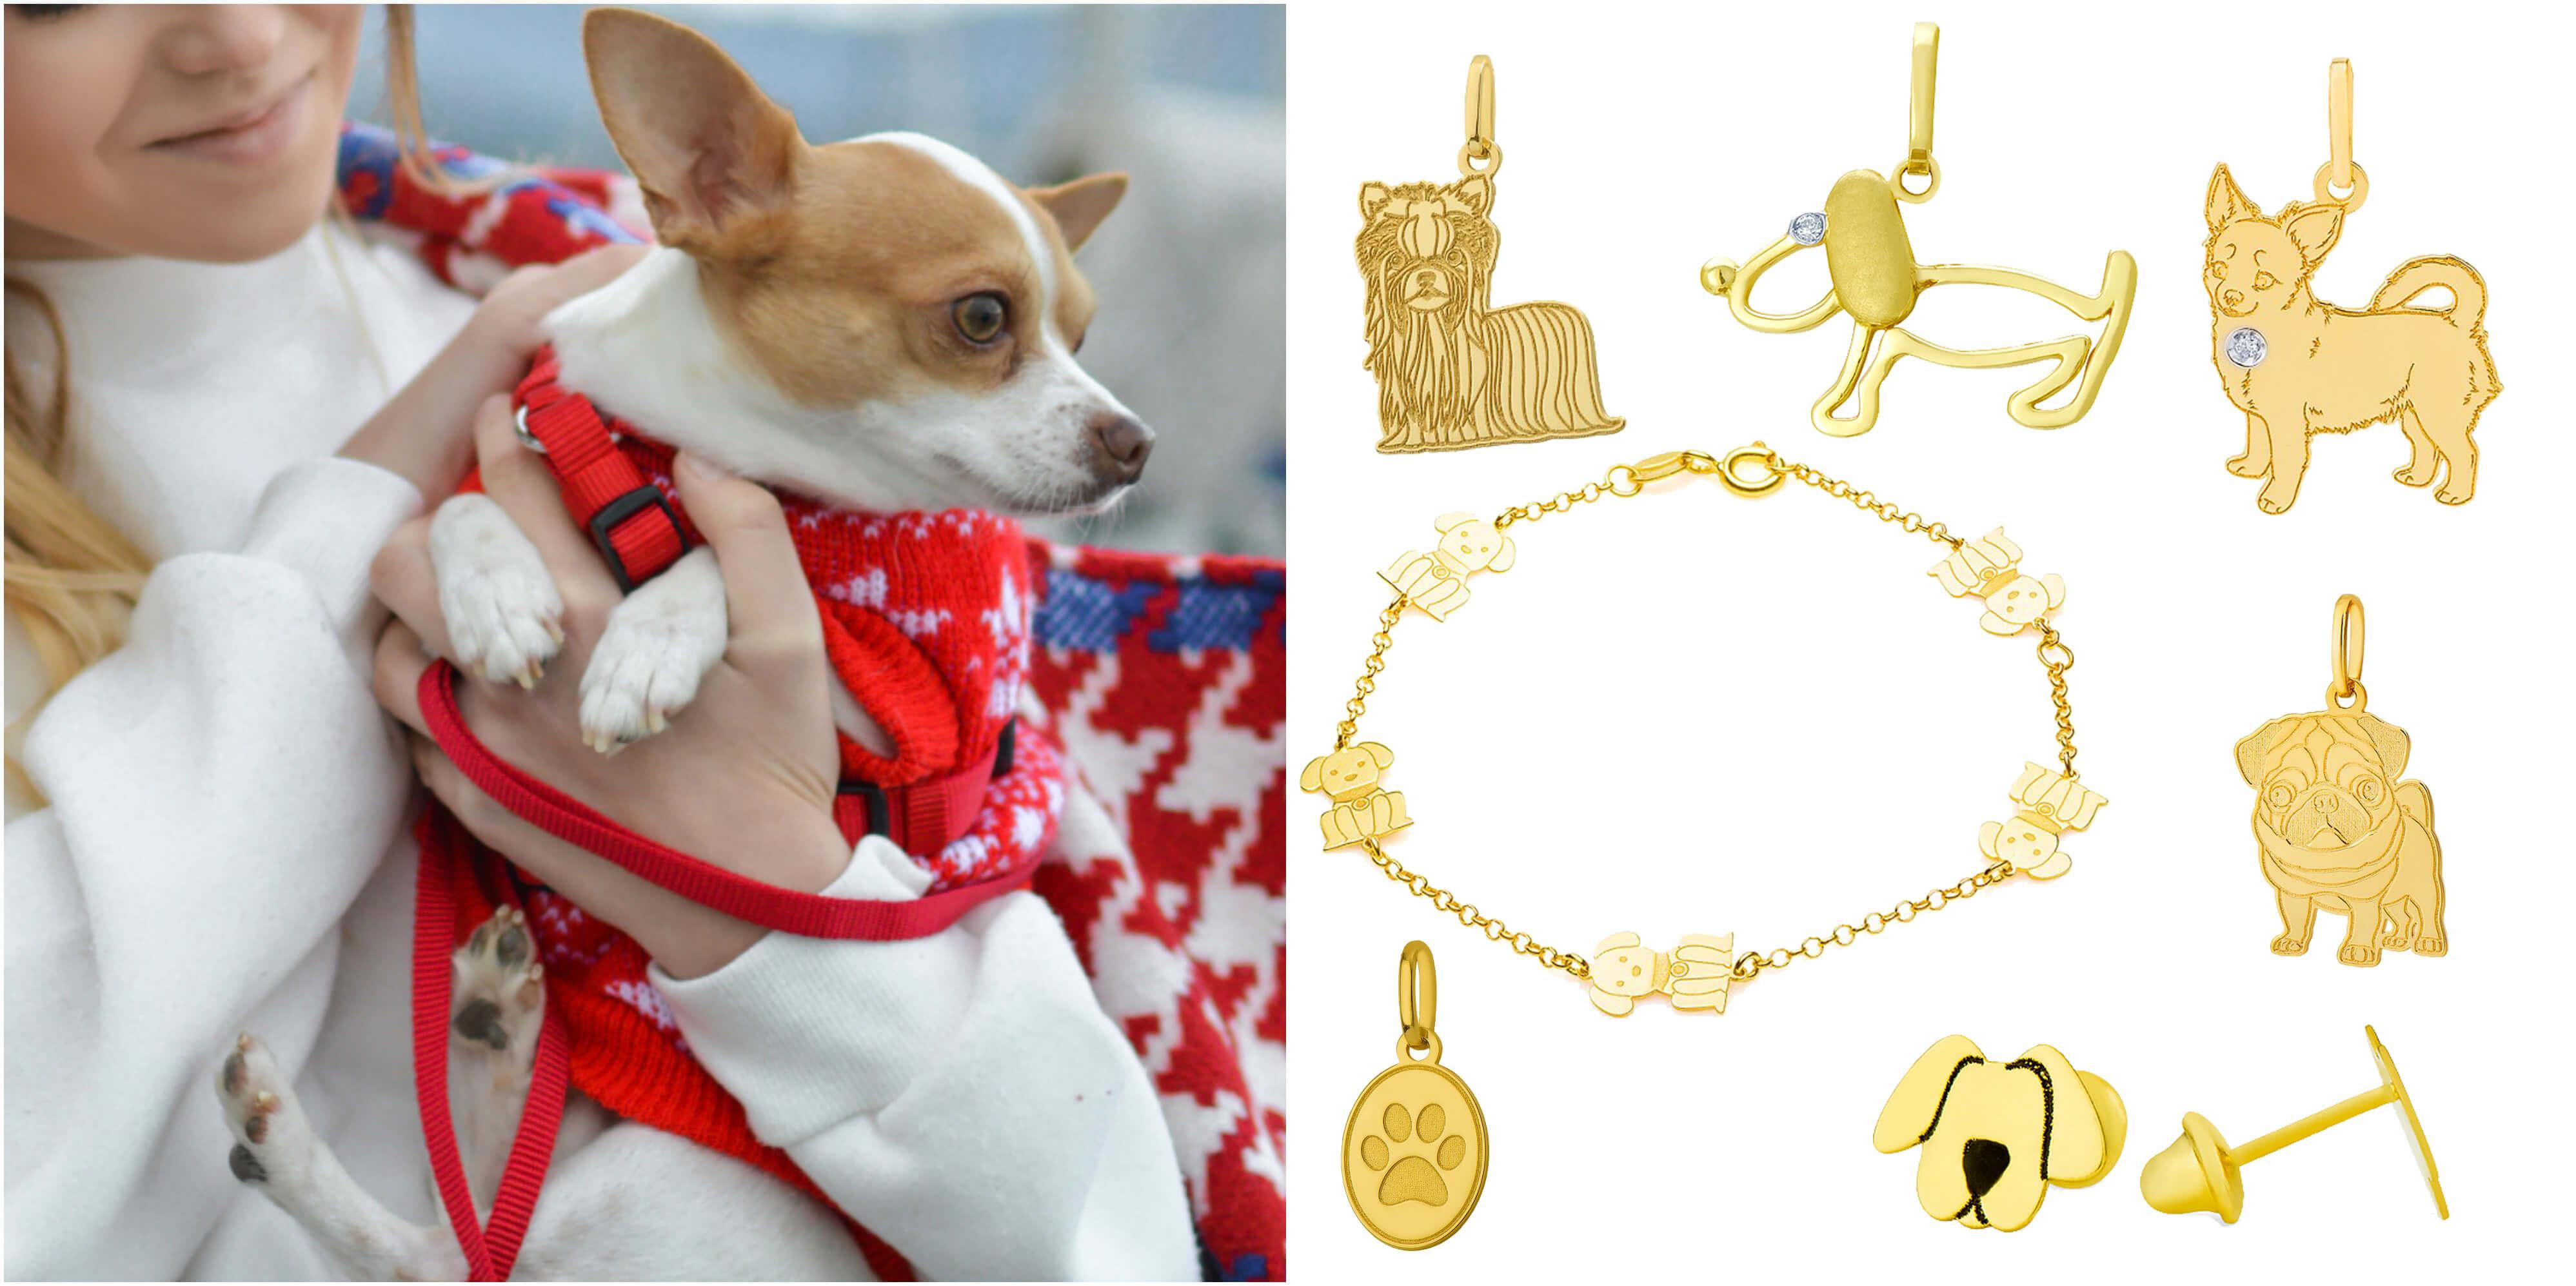 cachorros-animais-ouro-joiasgold